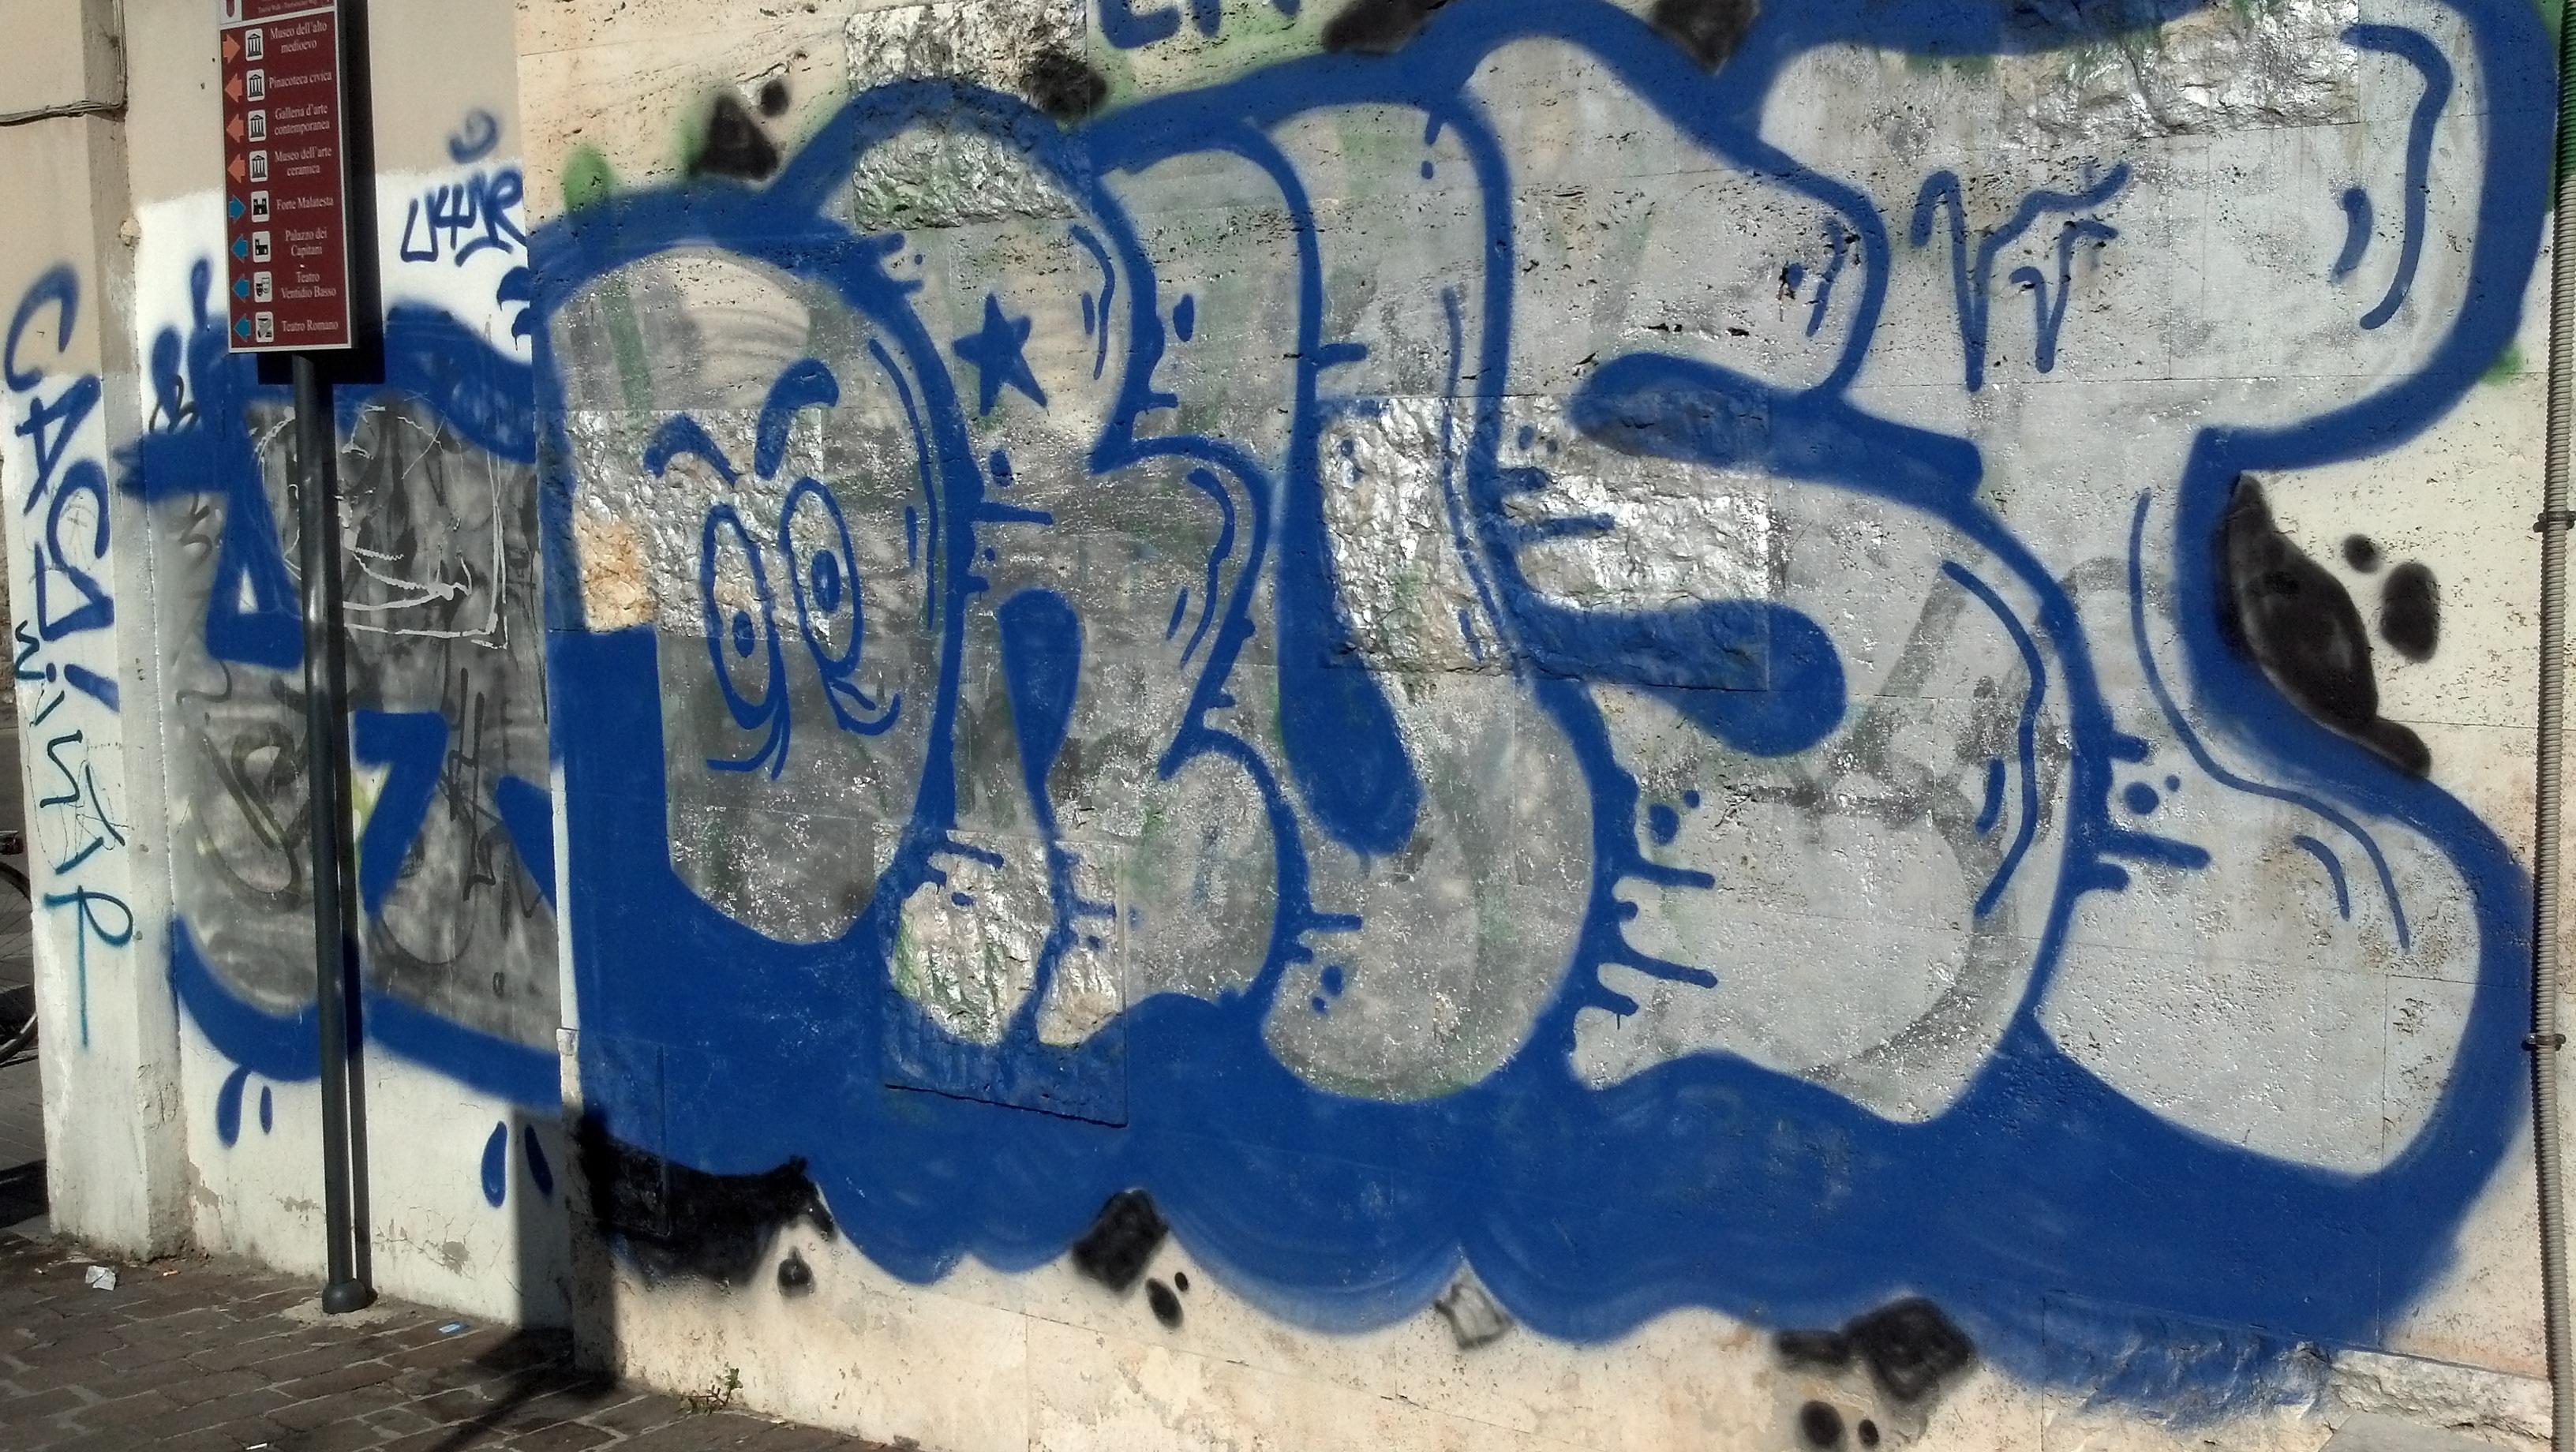 Graffiti ad Ascoli, ottobre 2012 1